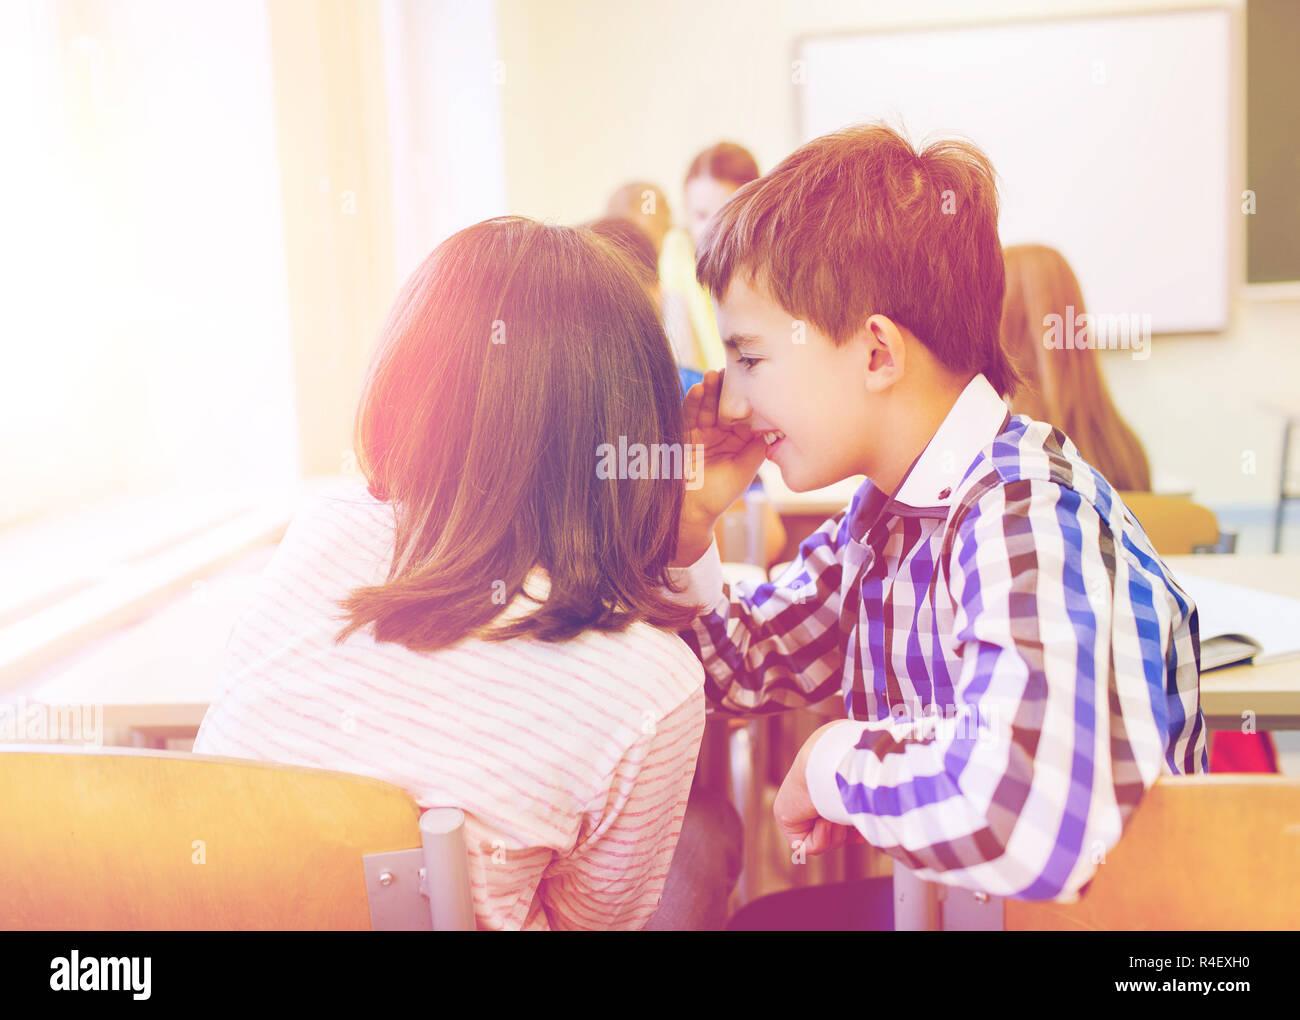 smiling schoolgirl whispering to classmate ear - Stock Image